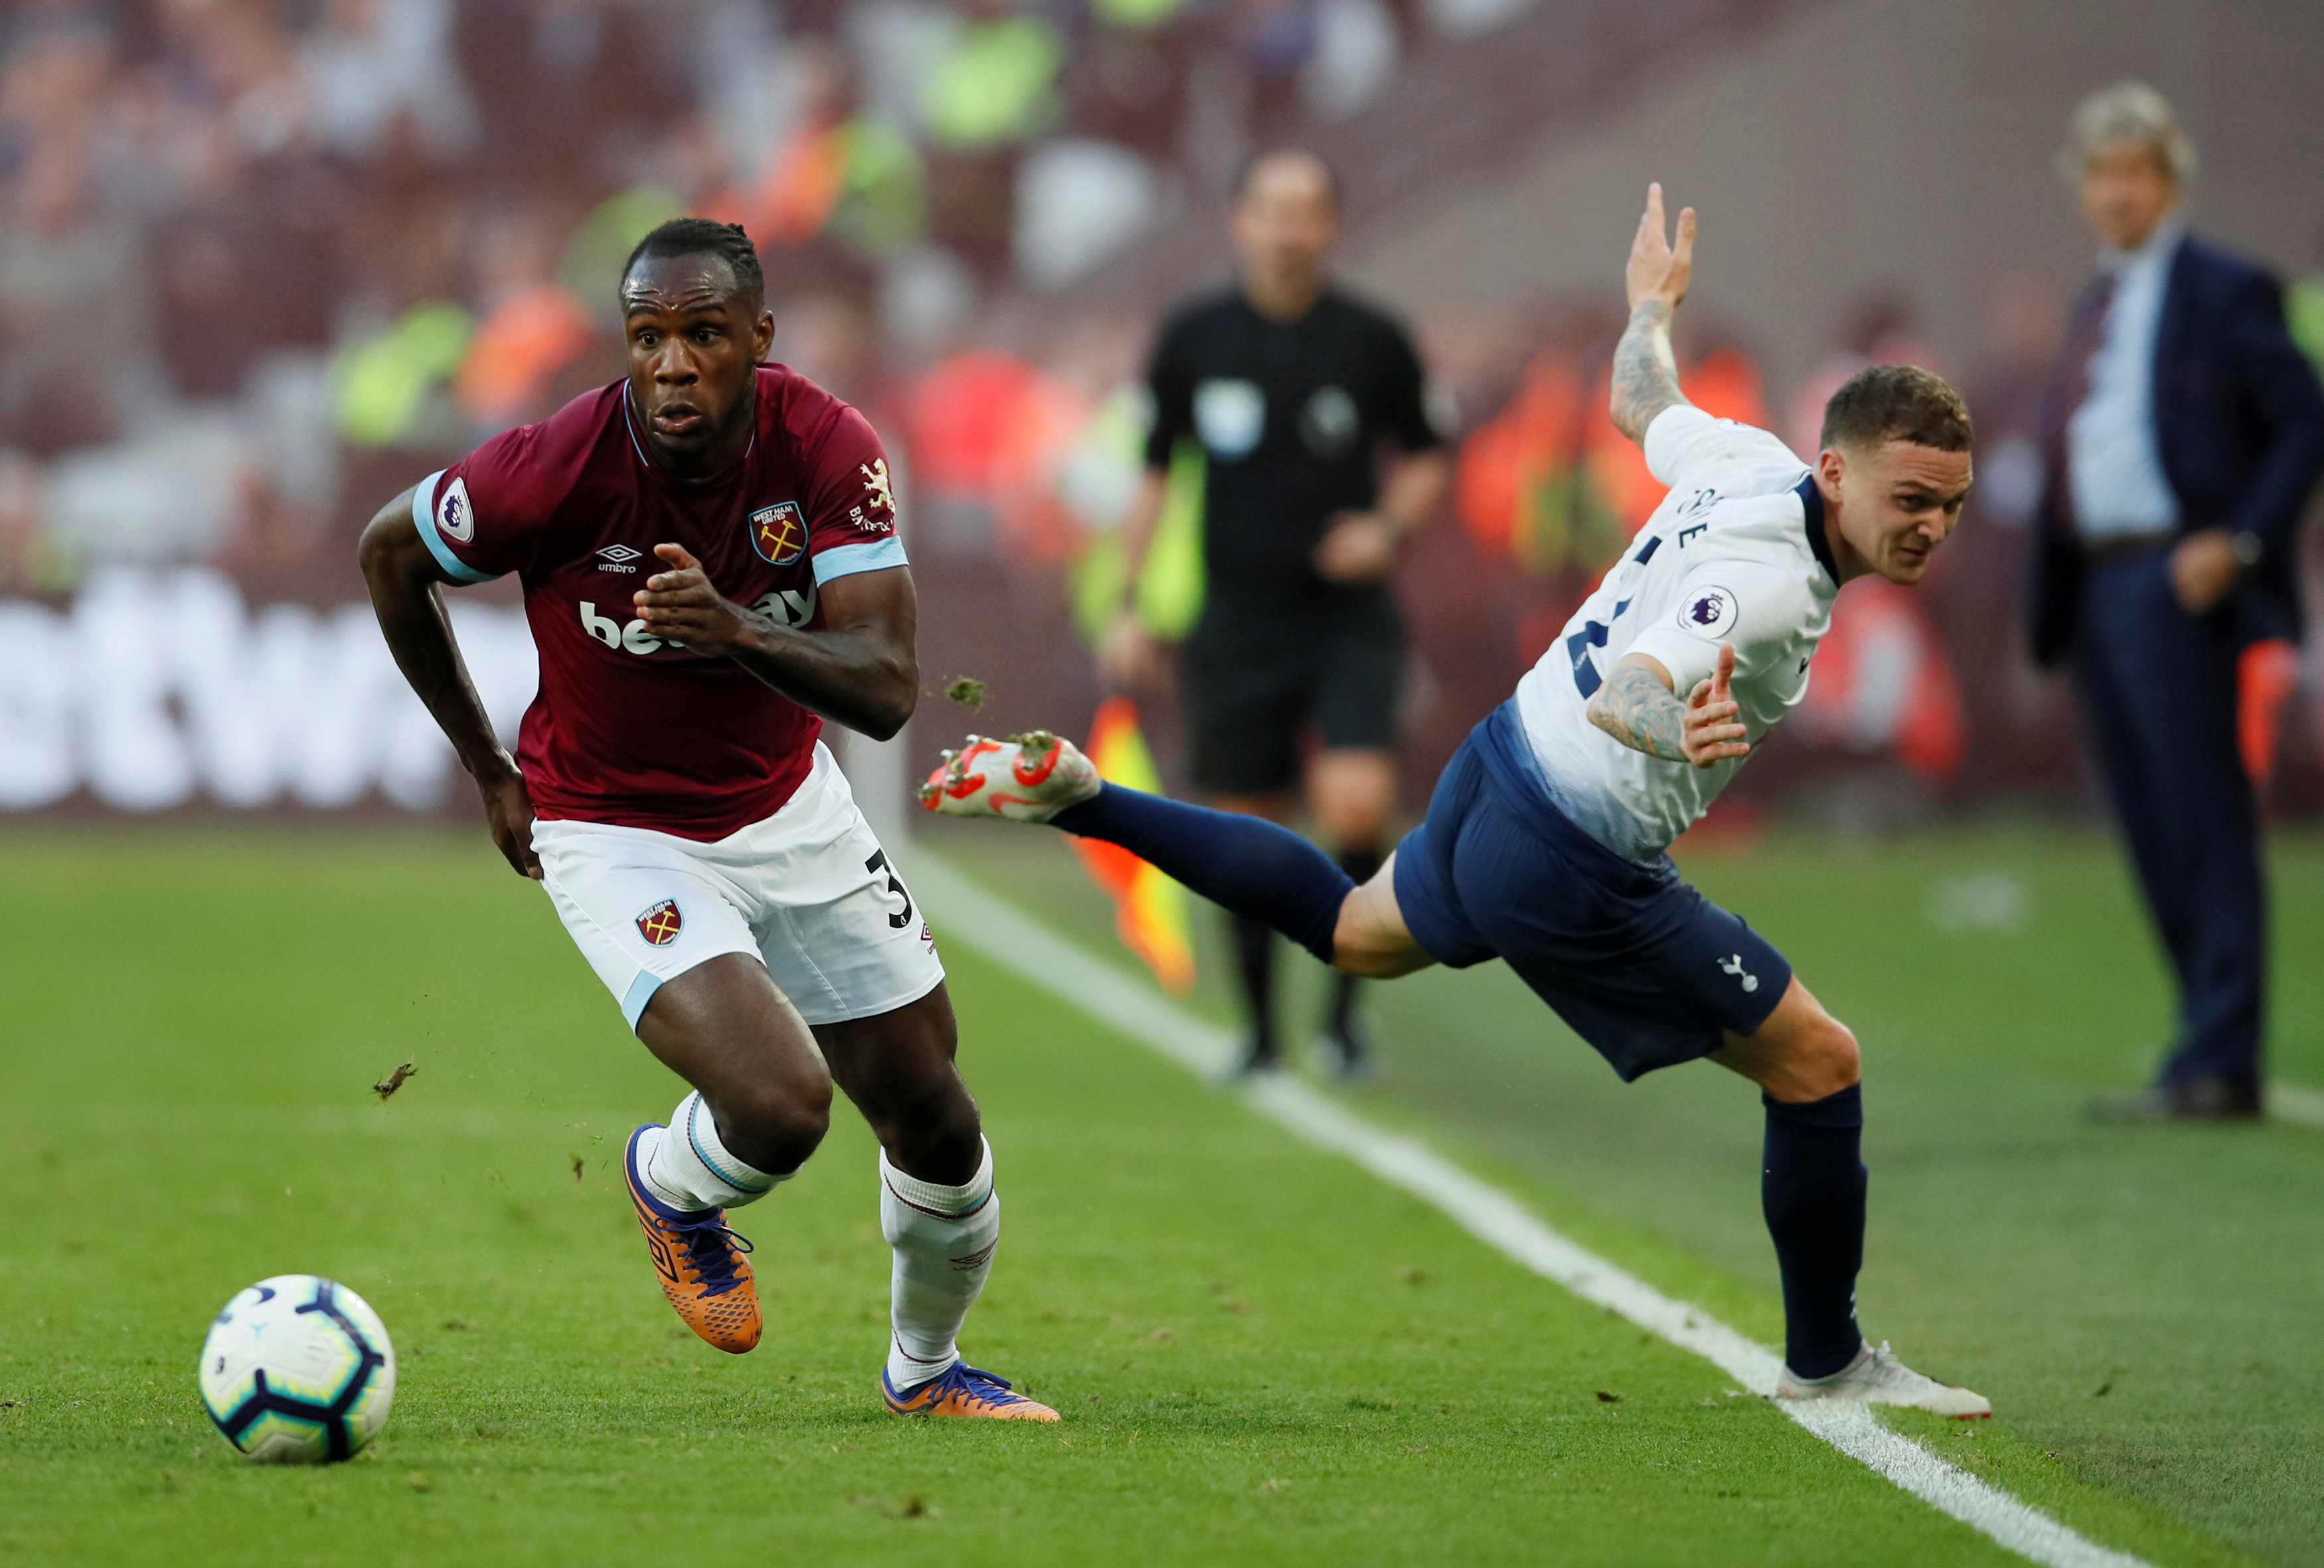 West Ham United v Tottenham Hotspur live - Live - BBC Sport